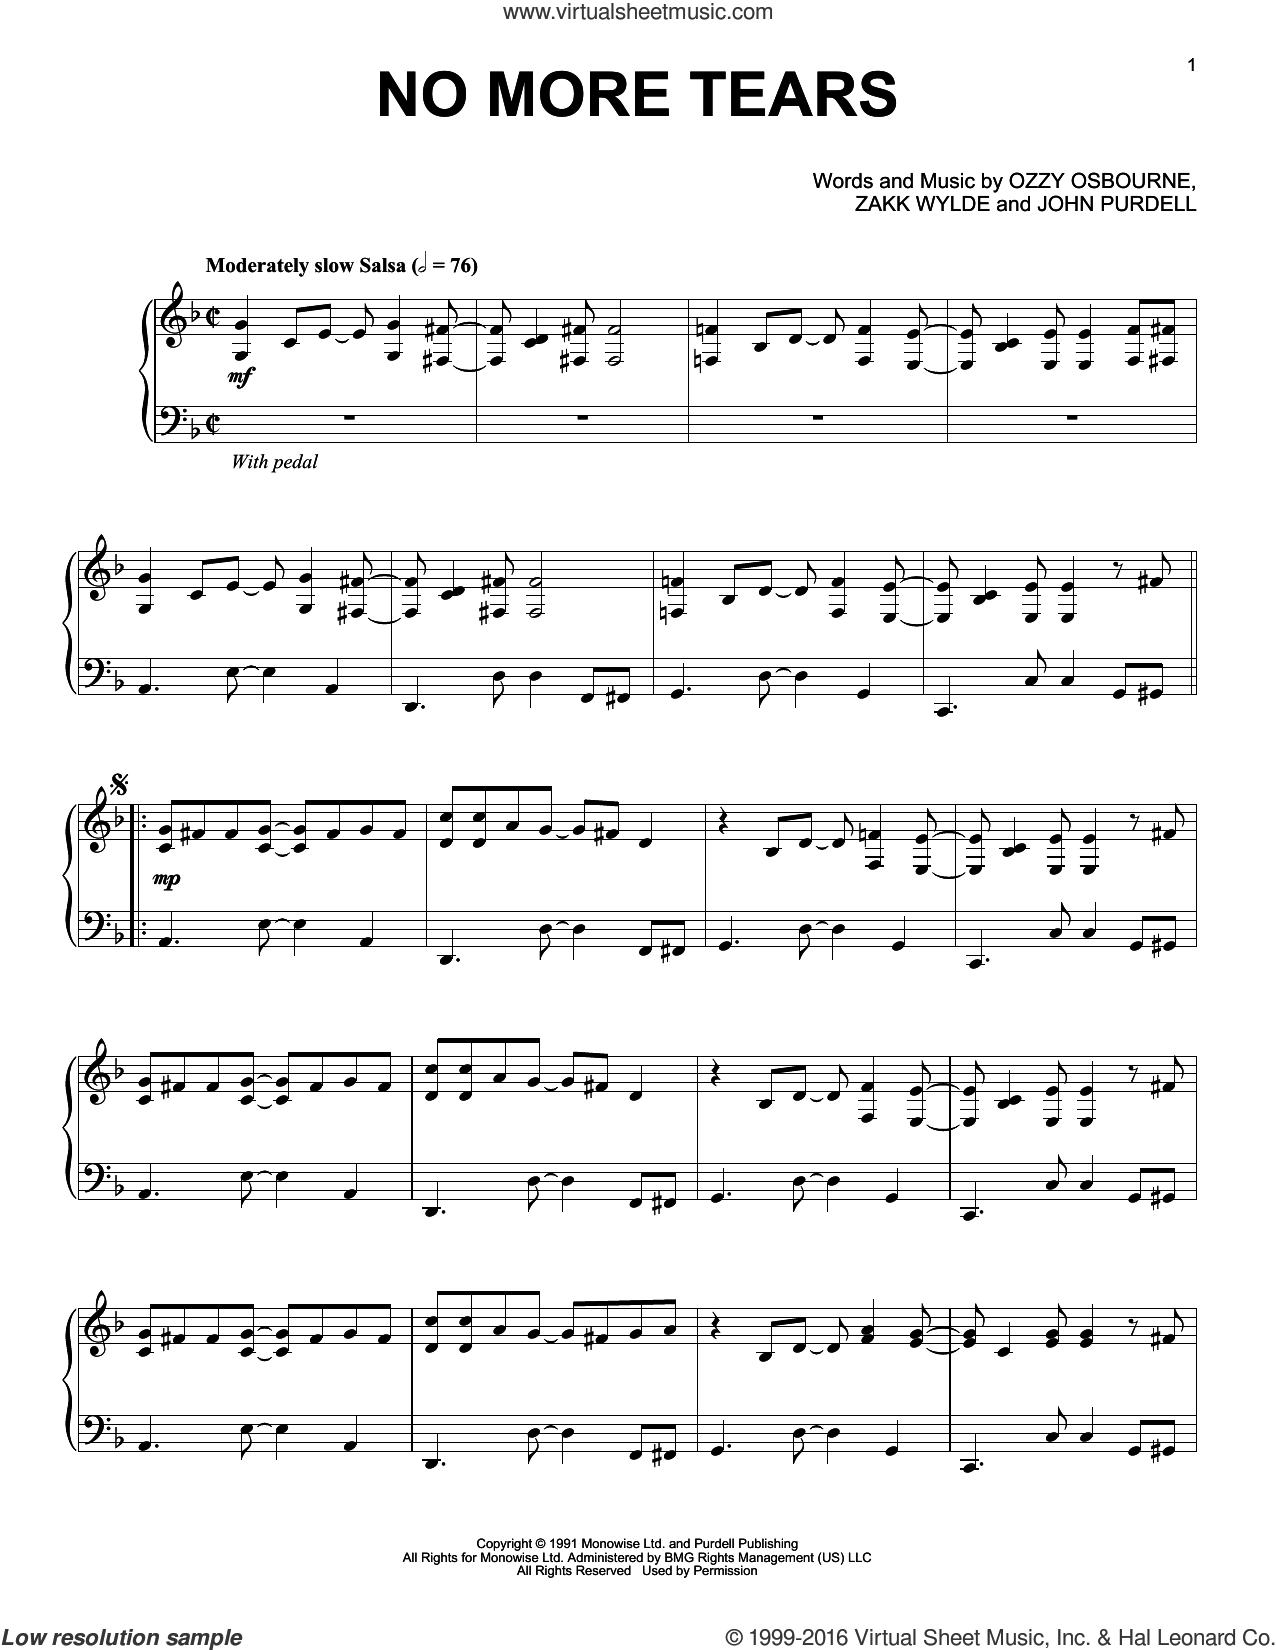 No More Tears [Jazz version] sheet music for piano solo by Ozzy Osbourne, John Purdell and Zakk Wylde, intermediate skill level